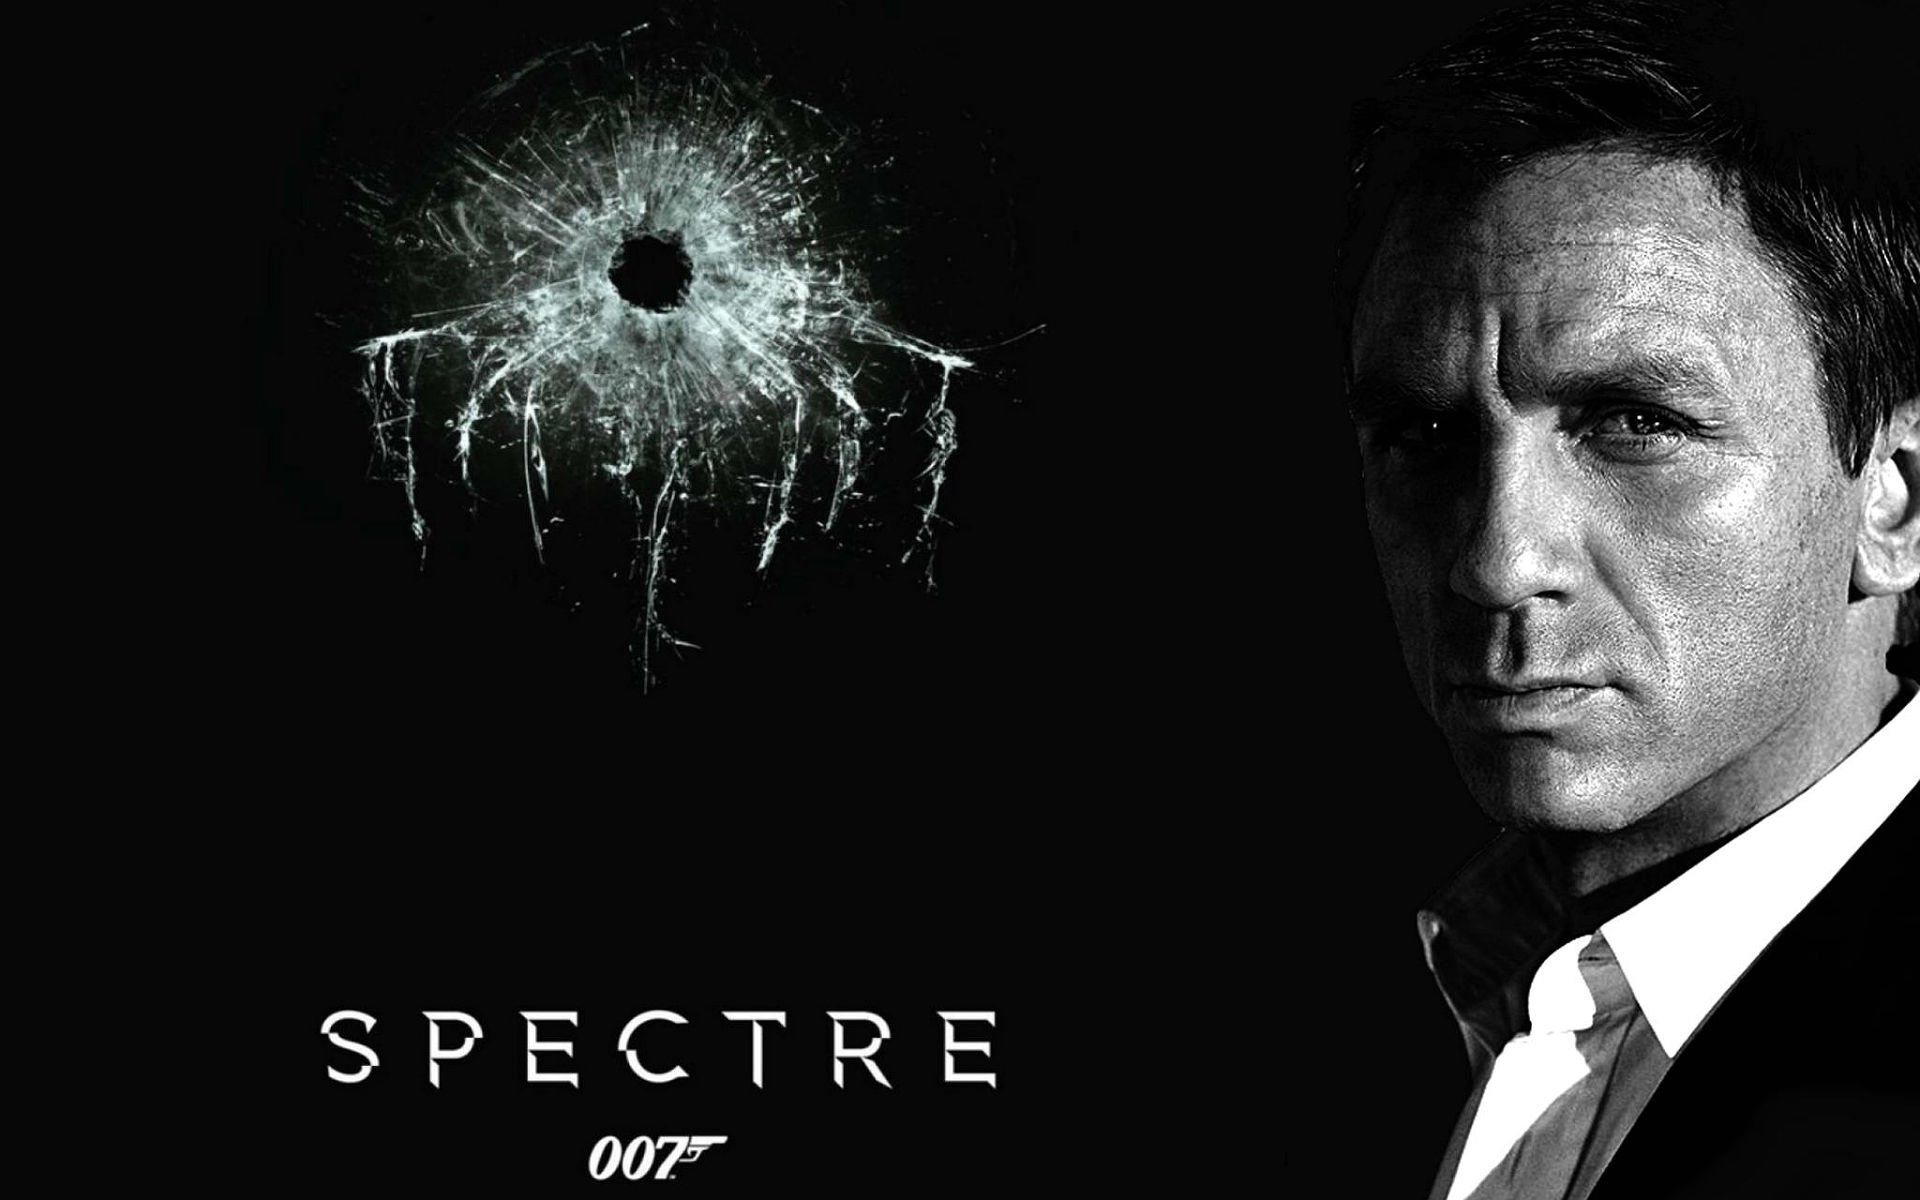 spy crime thriller mystery 1spectre 007 poster wallpaper background 1920x1200